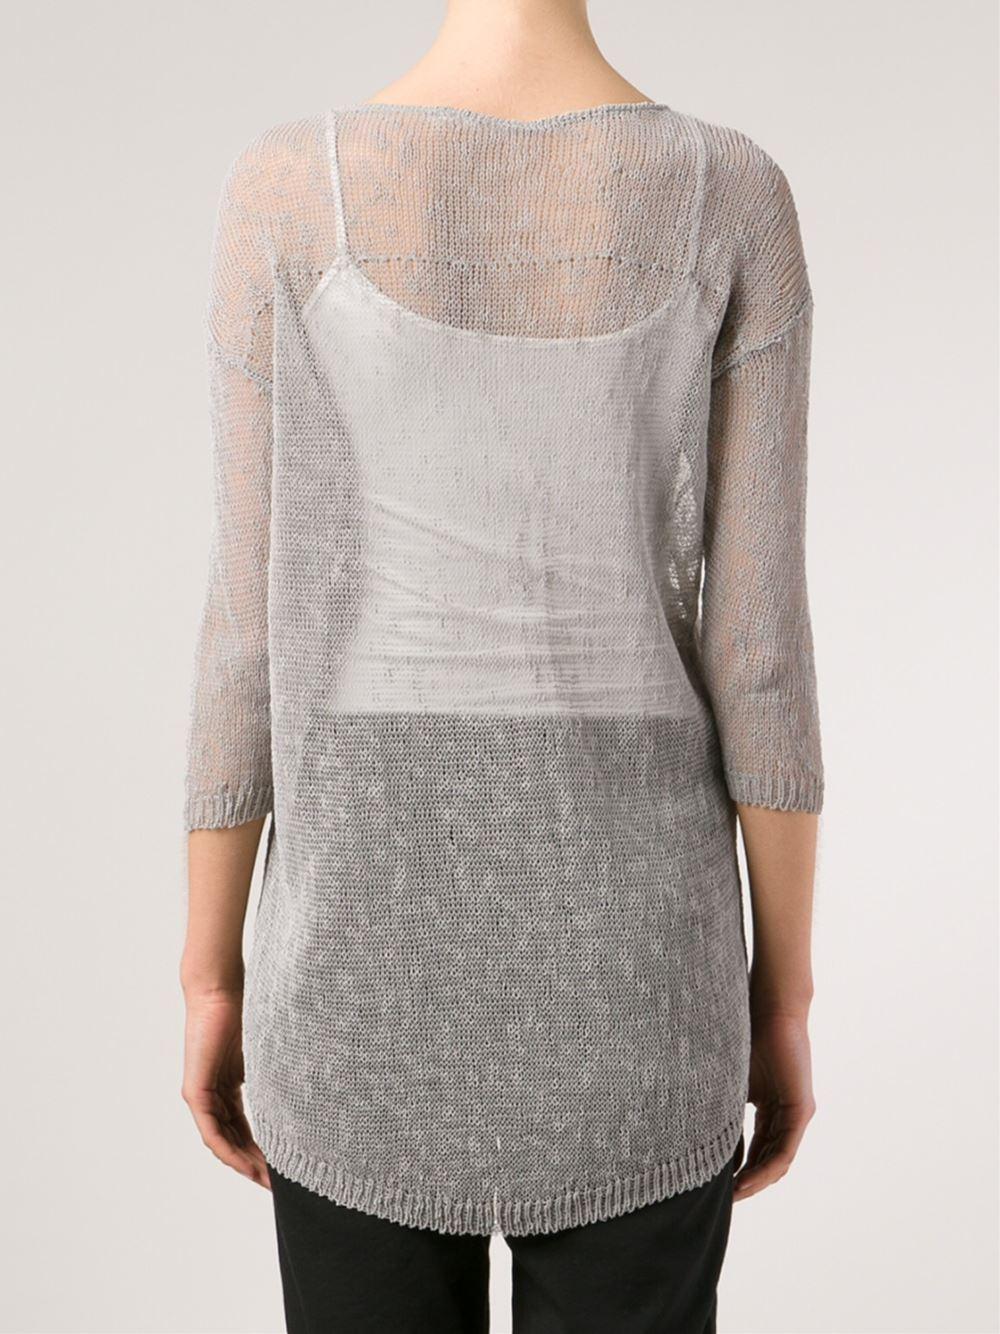 Transit Sheer Sweater in Gray   Lyst